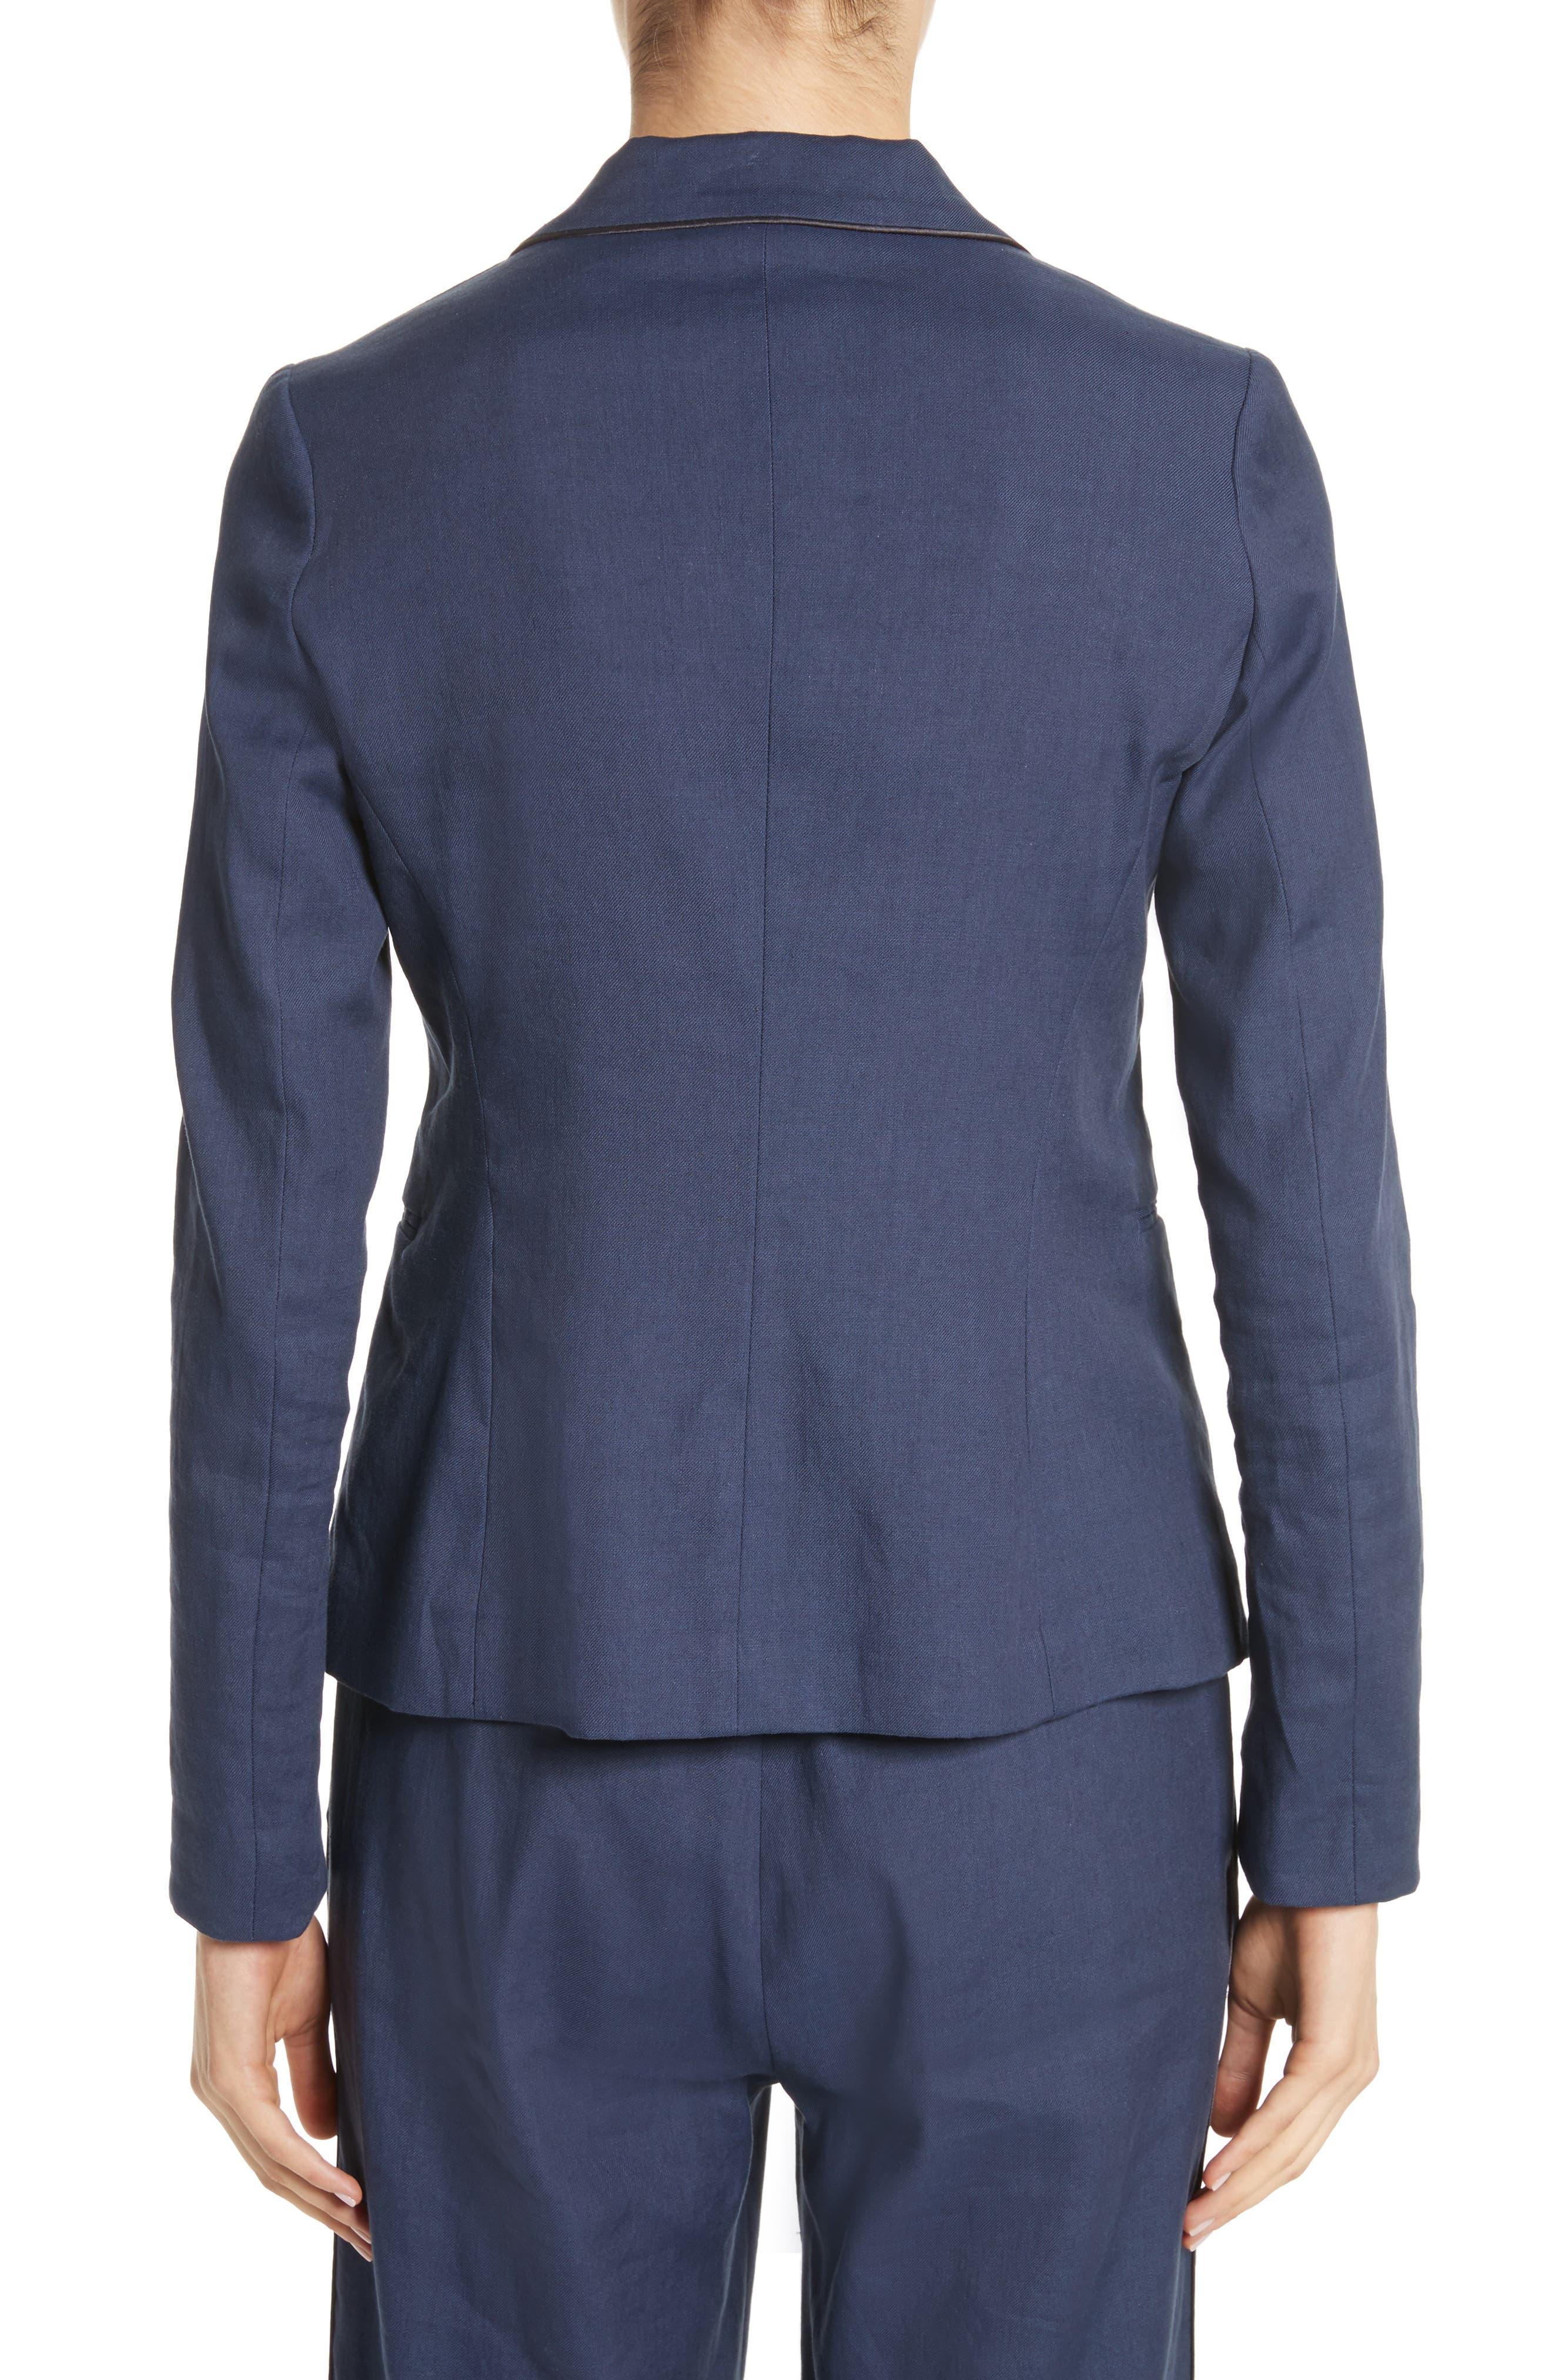 Piped Linen & Cotton Blend Blazer,                             Alternate thumbnail 2, color,